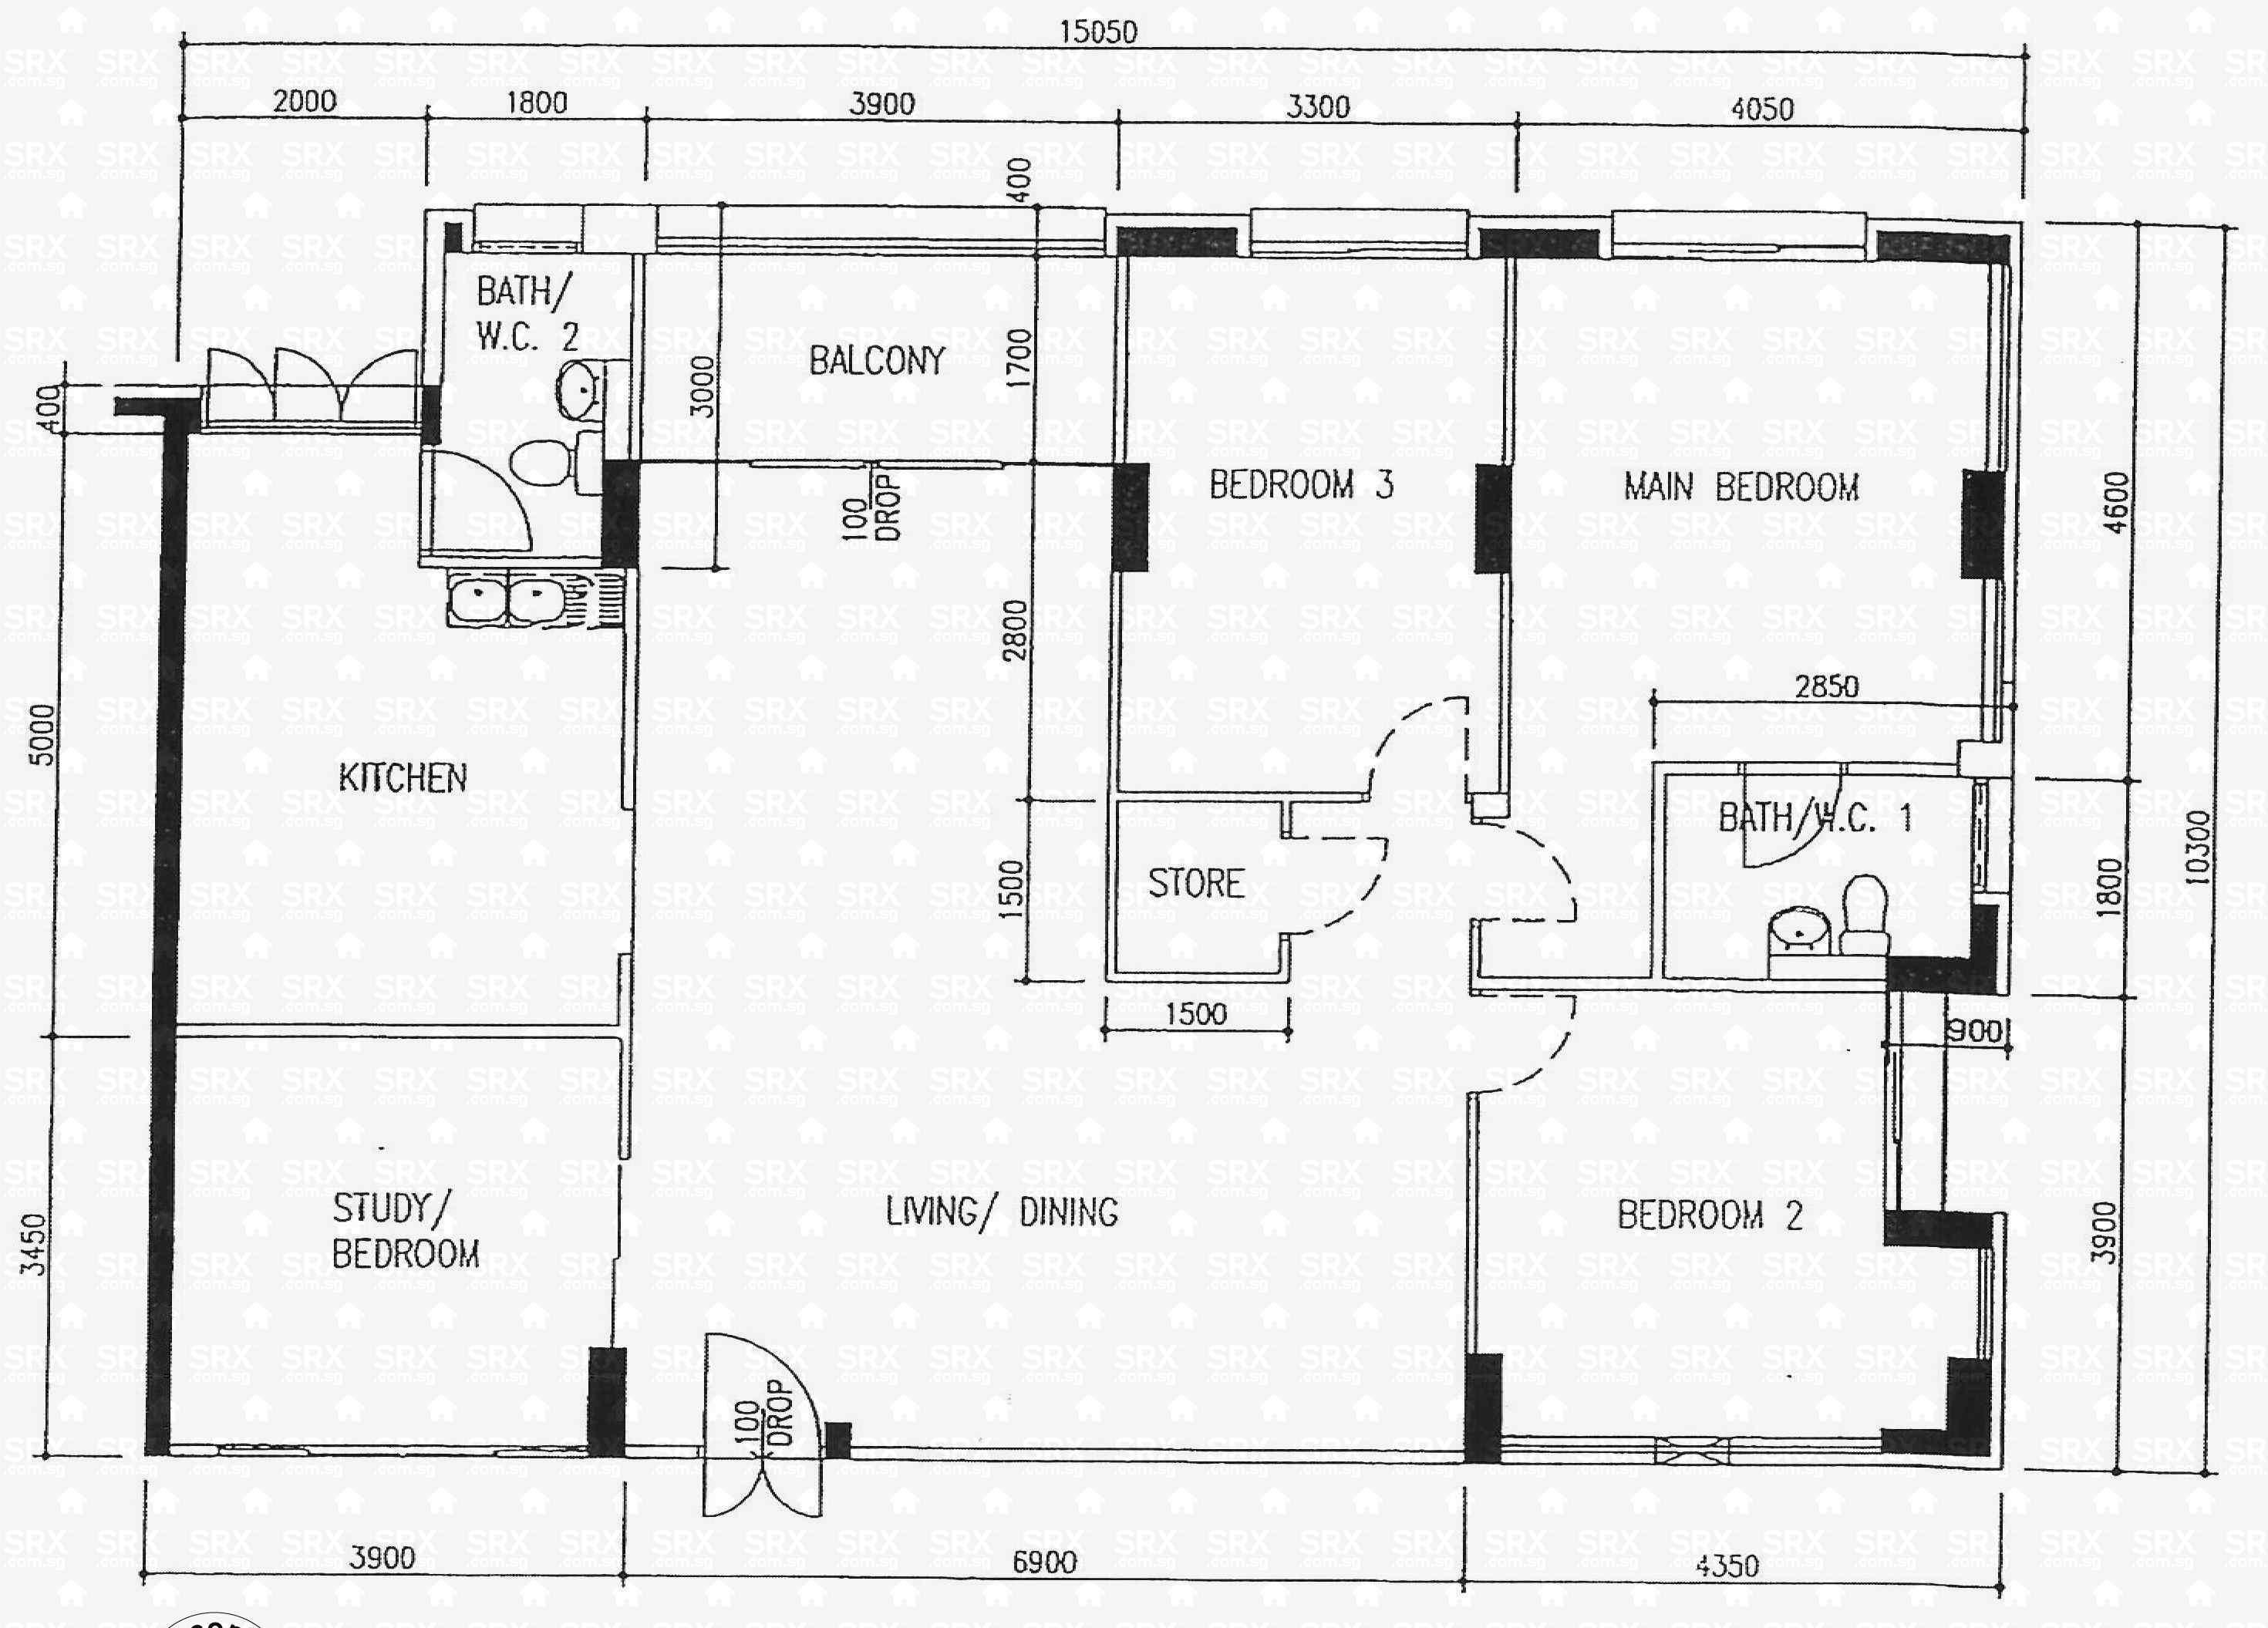 Floor plans for 239 pasir ris street 21 s 510239 hdb for 509 plans